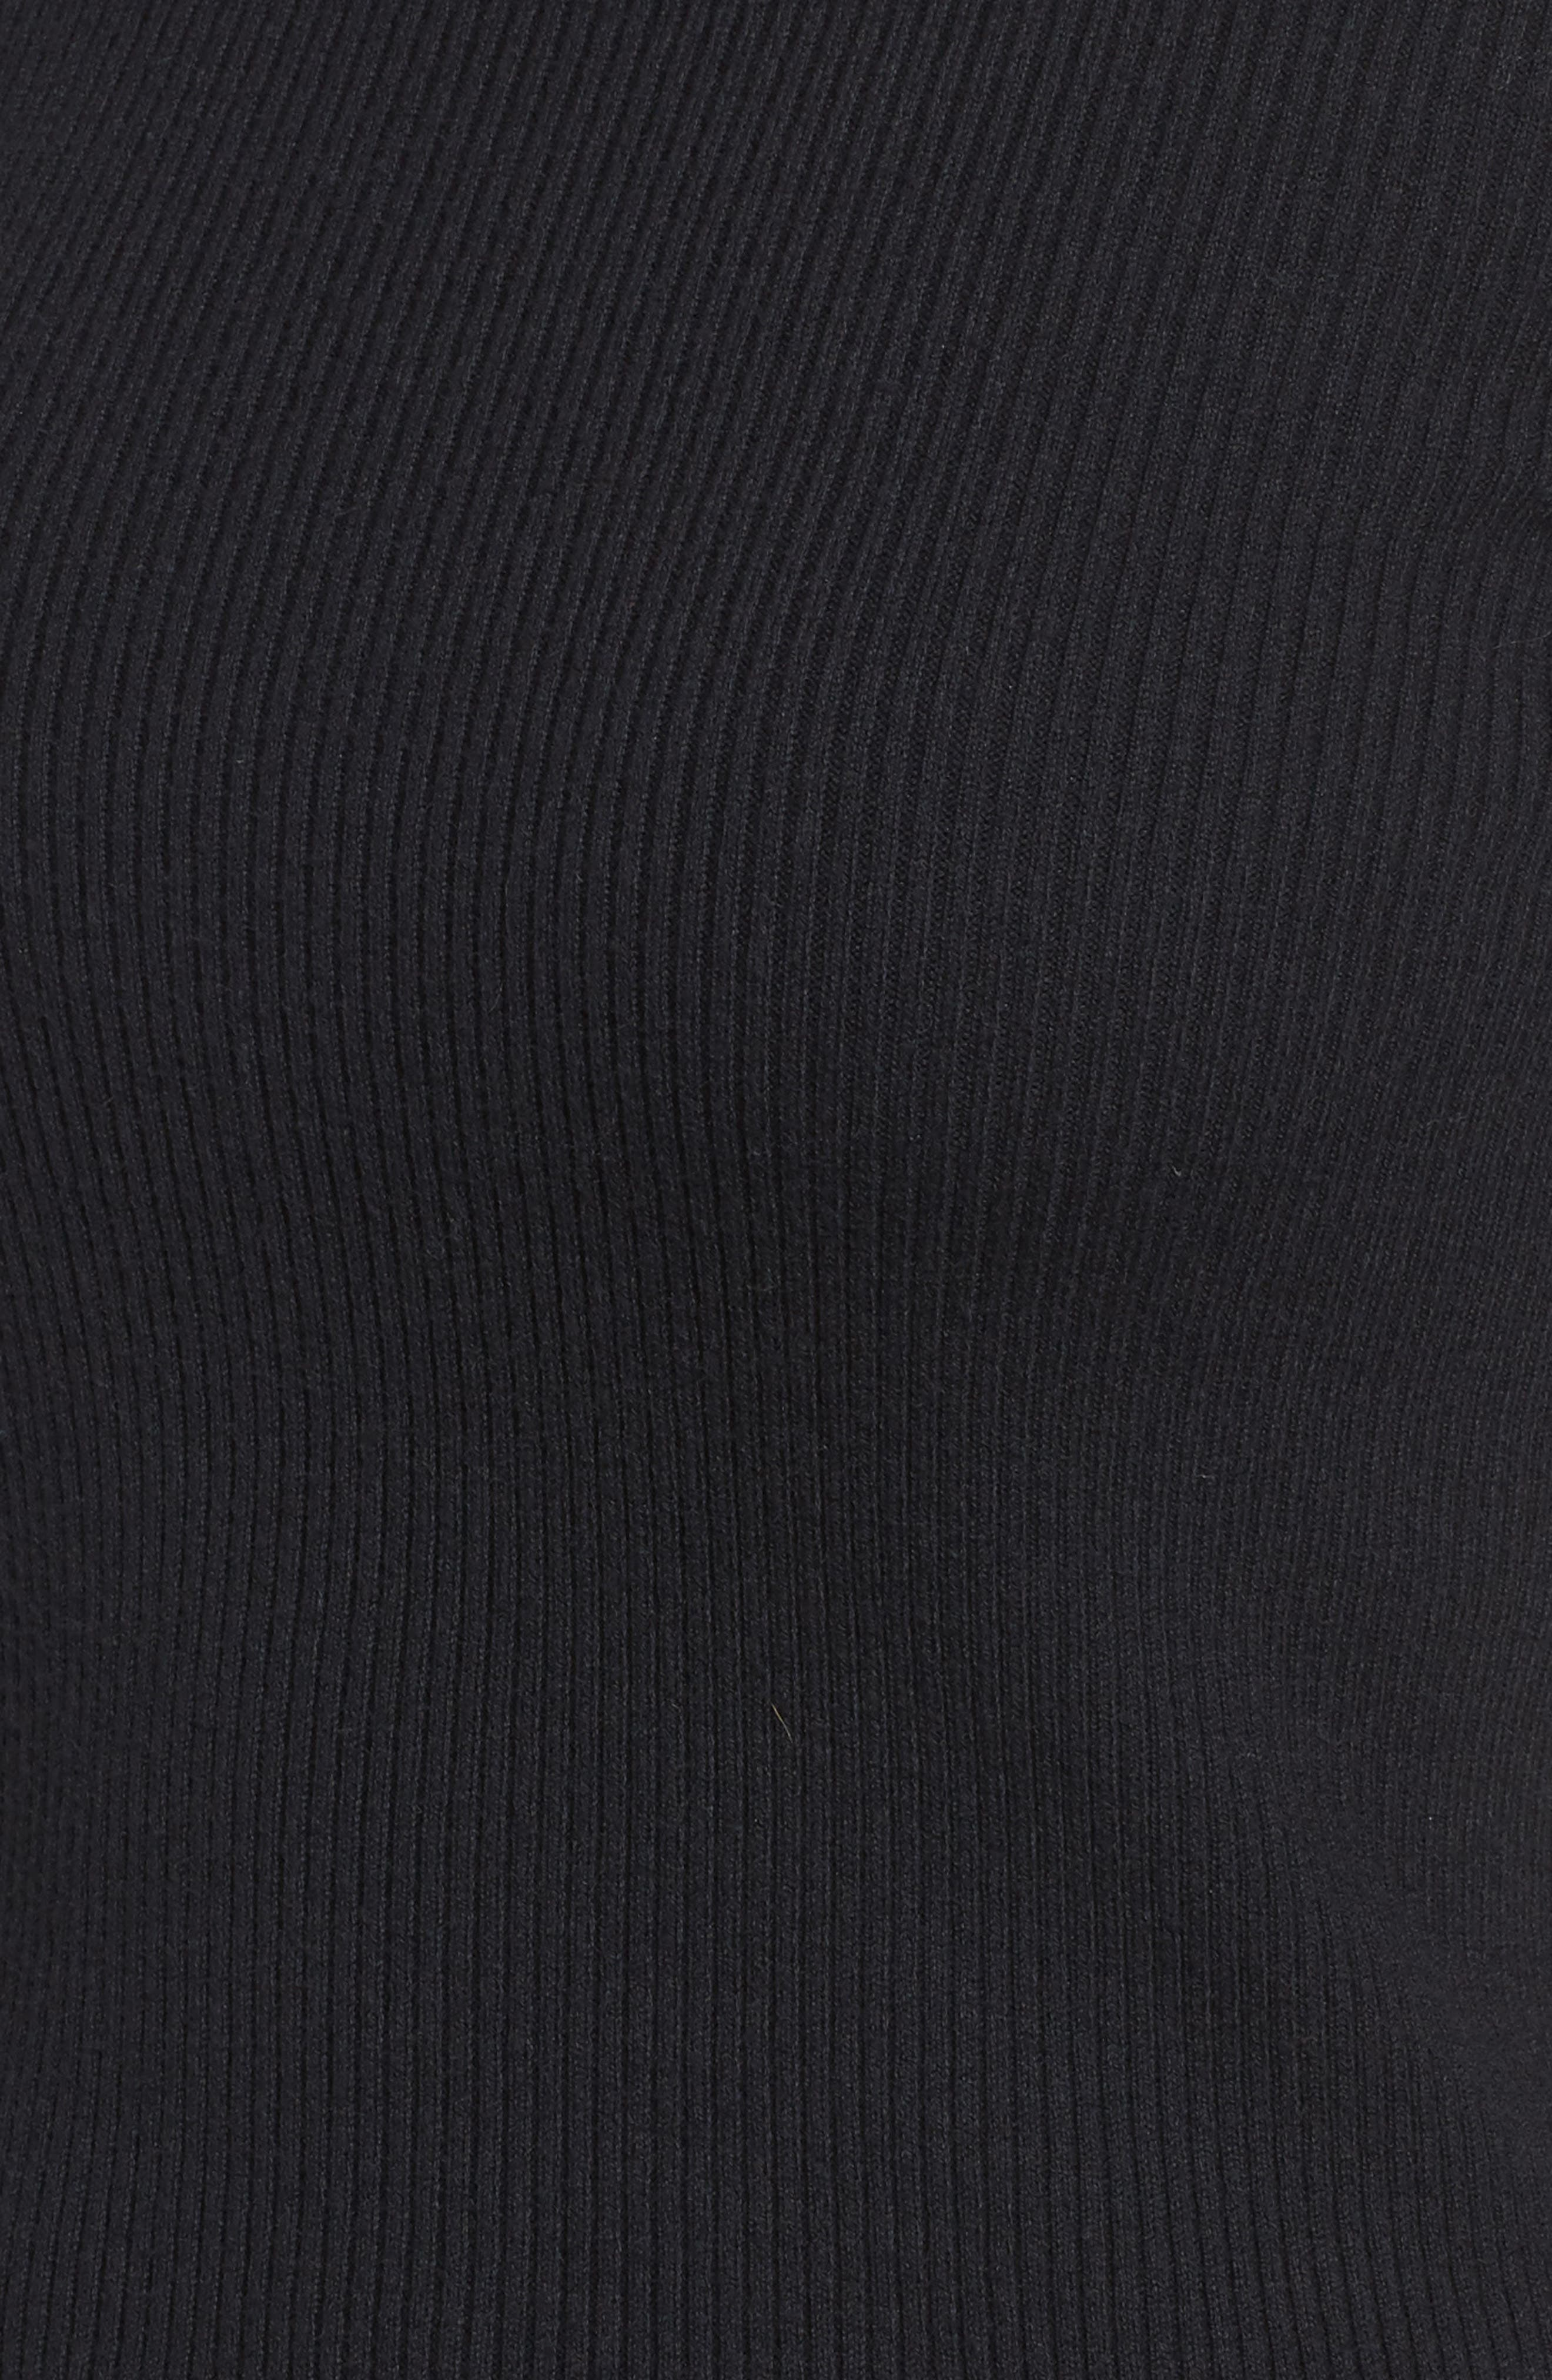 Bell Sleeve Sweater,                             Alternate thumbnail 5, color,                             Black- Grey Dark Heather Combo